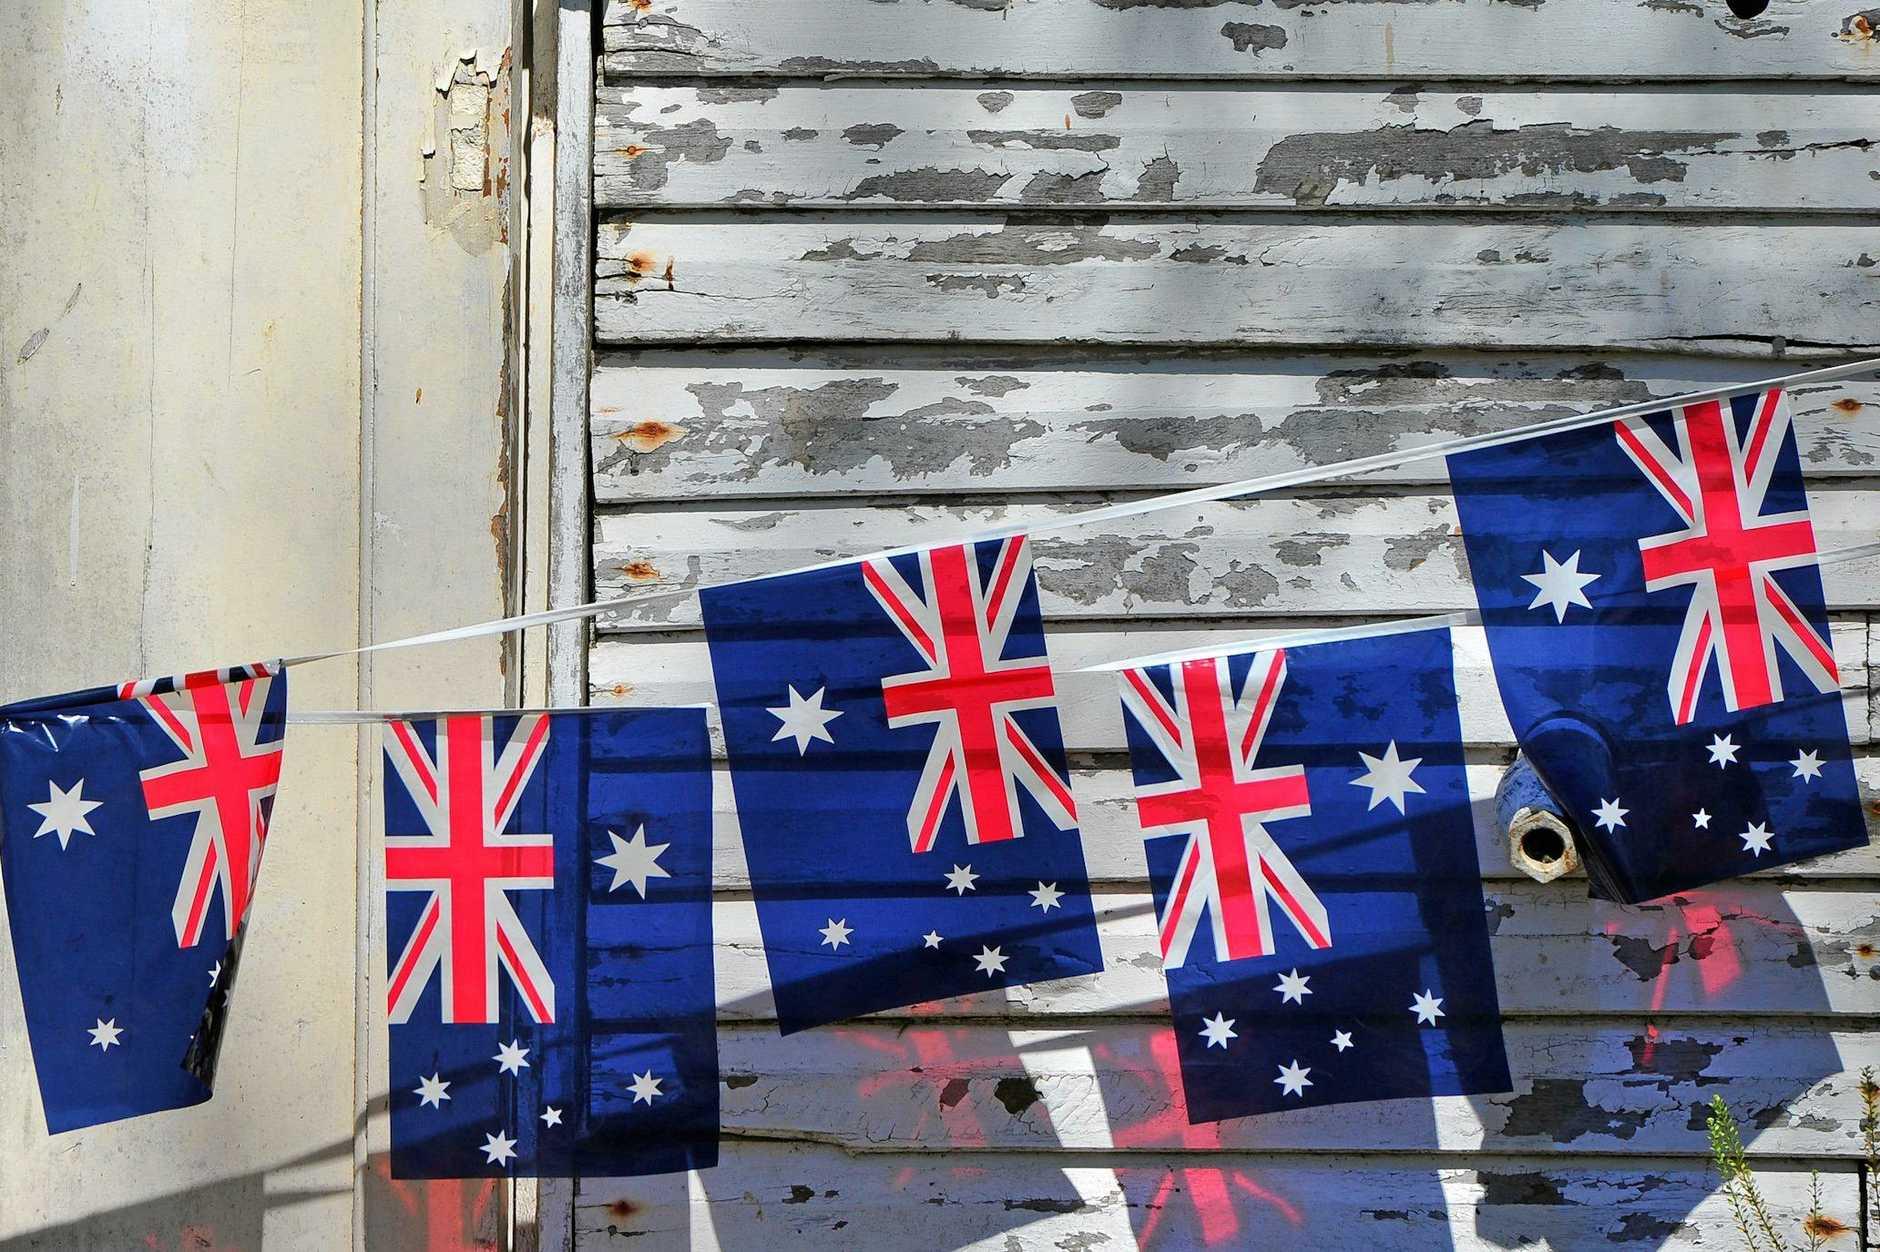 AUSTRALIA DAY: There's plenty happening around the region on January 26.